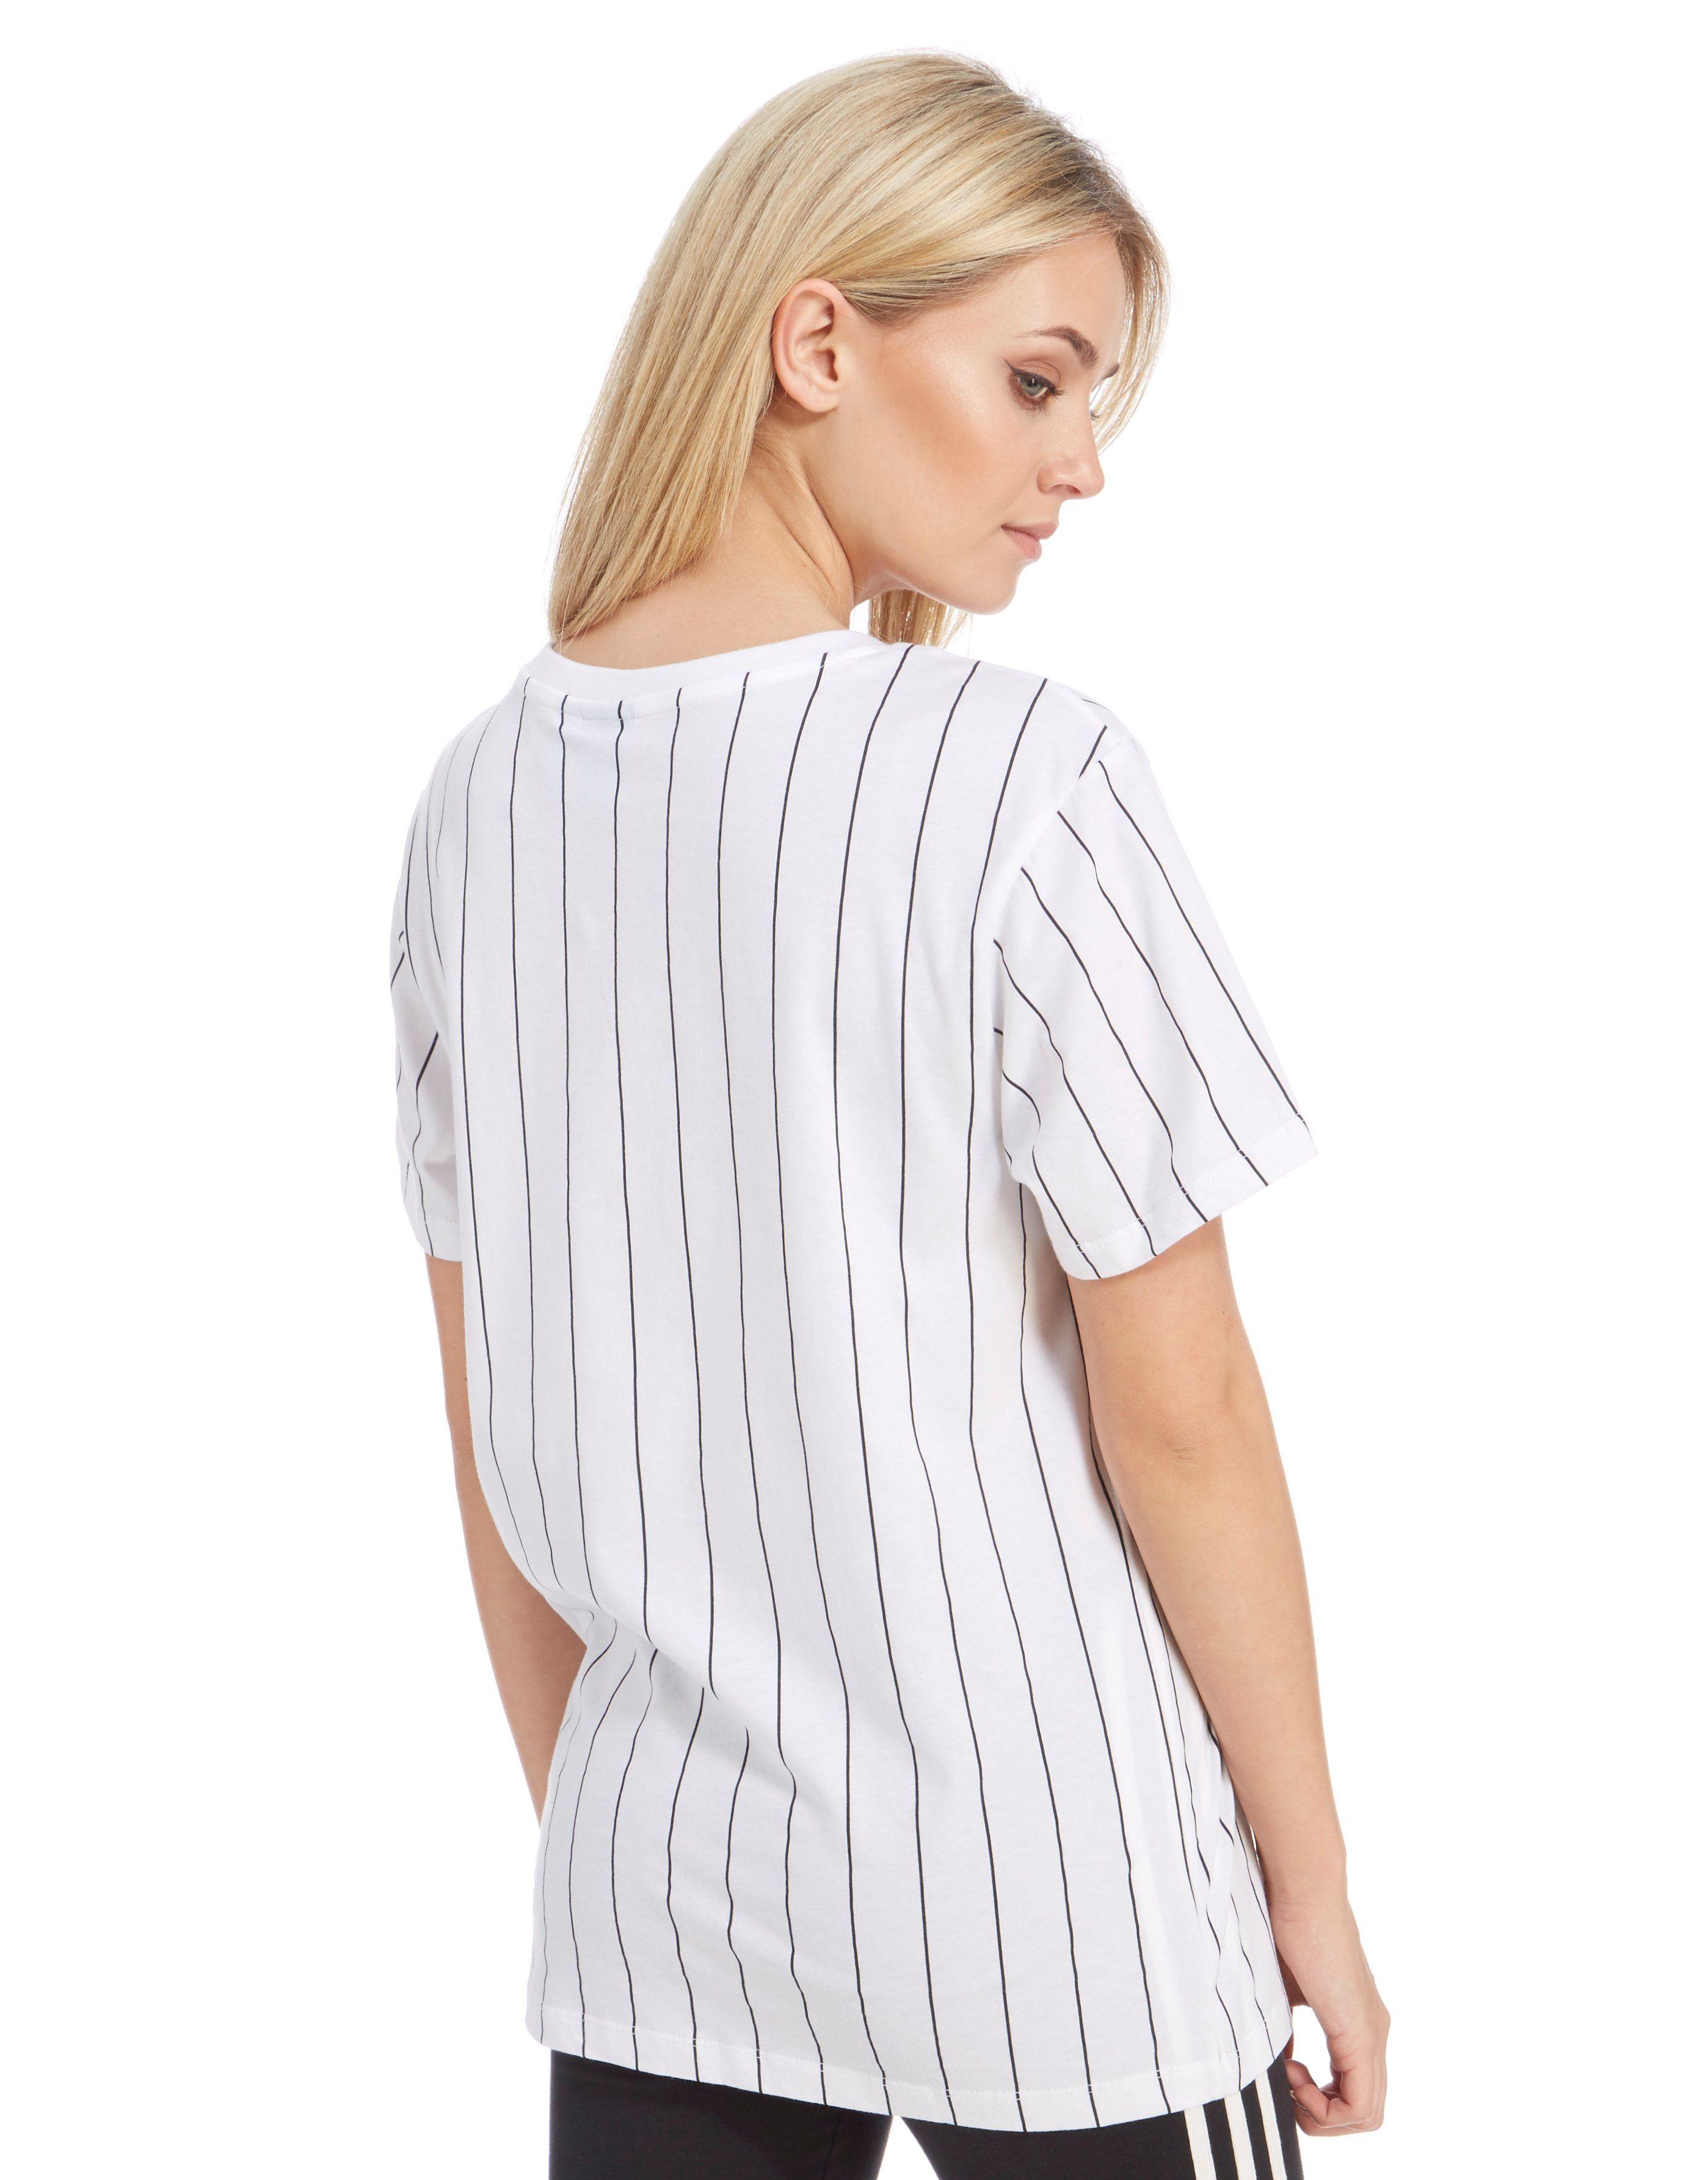 adidas Originals Trefoil Tennis T-Shirt